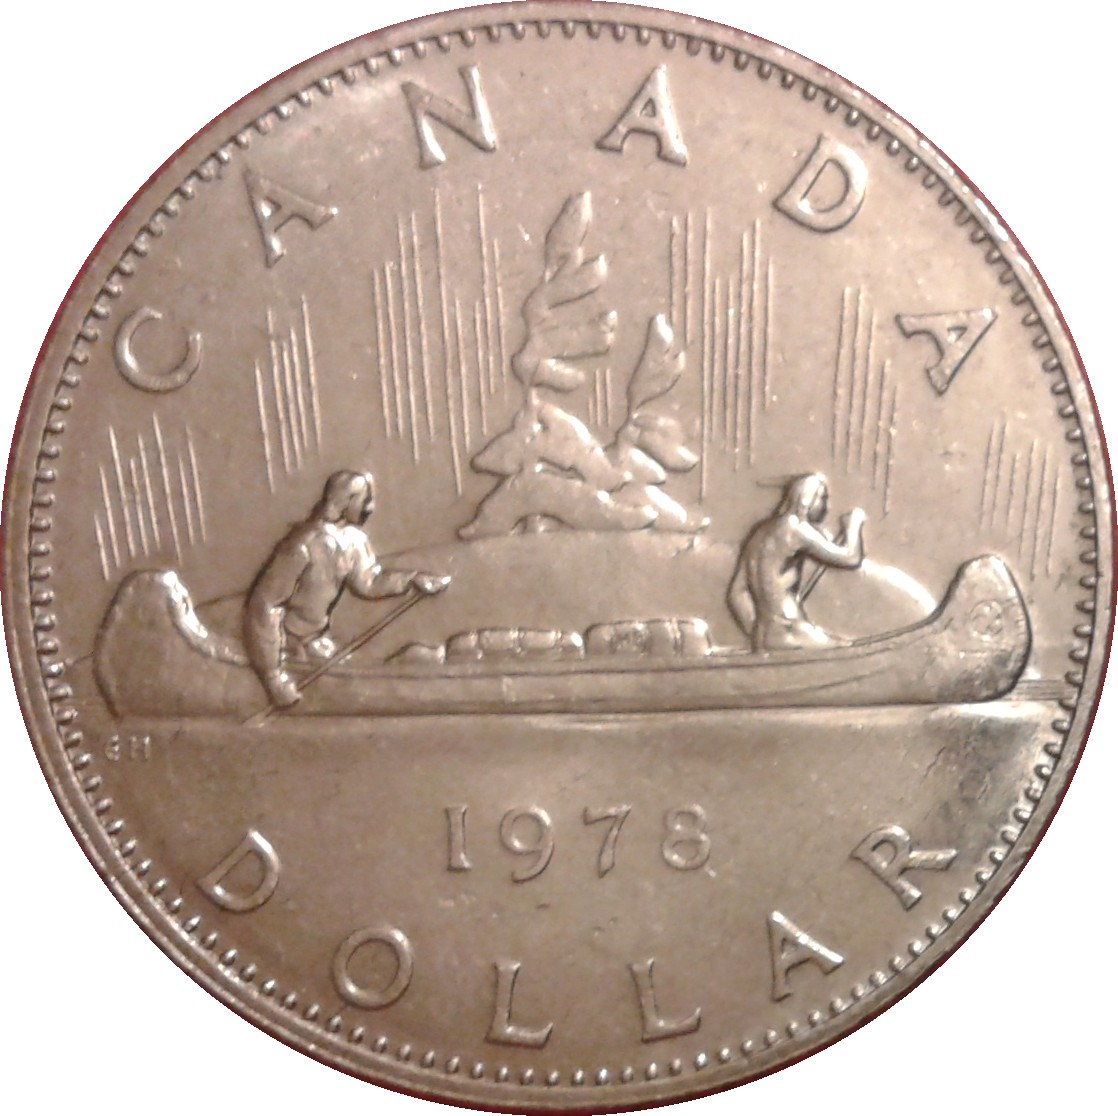 Canada 1978 Proof Like Voyageur Nickel Dollar!!